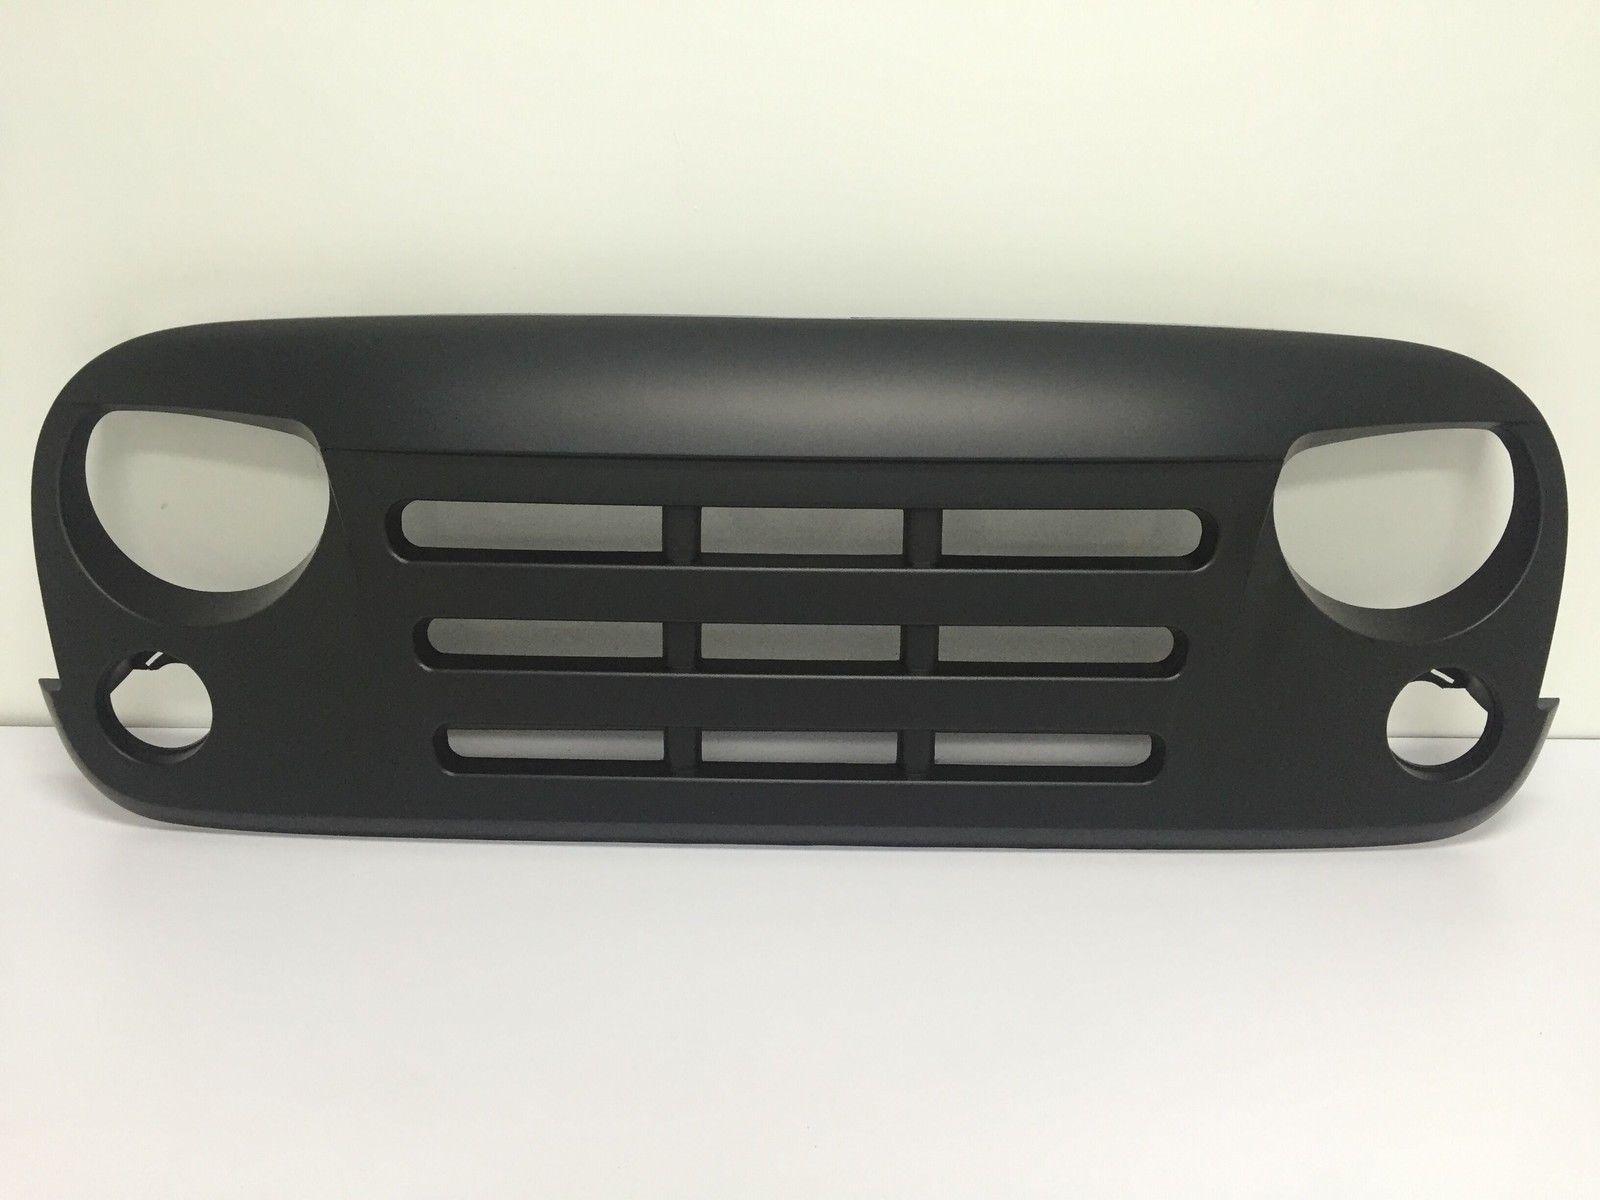 USグリル  トラック怒っている鳥のアップグレードフロントマットブラックグリルの外装ジープラングラーJK Truck Angry Bird Upgrade Front Matte Black Grille Exterior For Jeep Wrangler JK